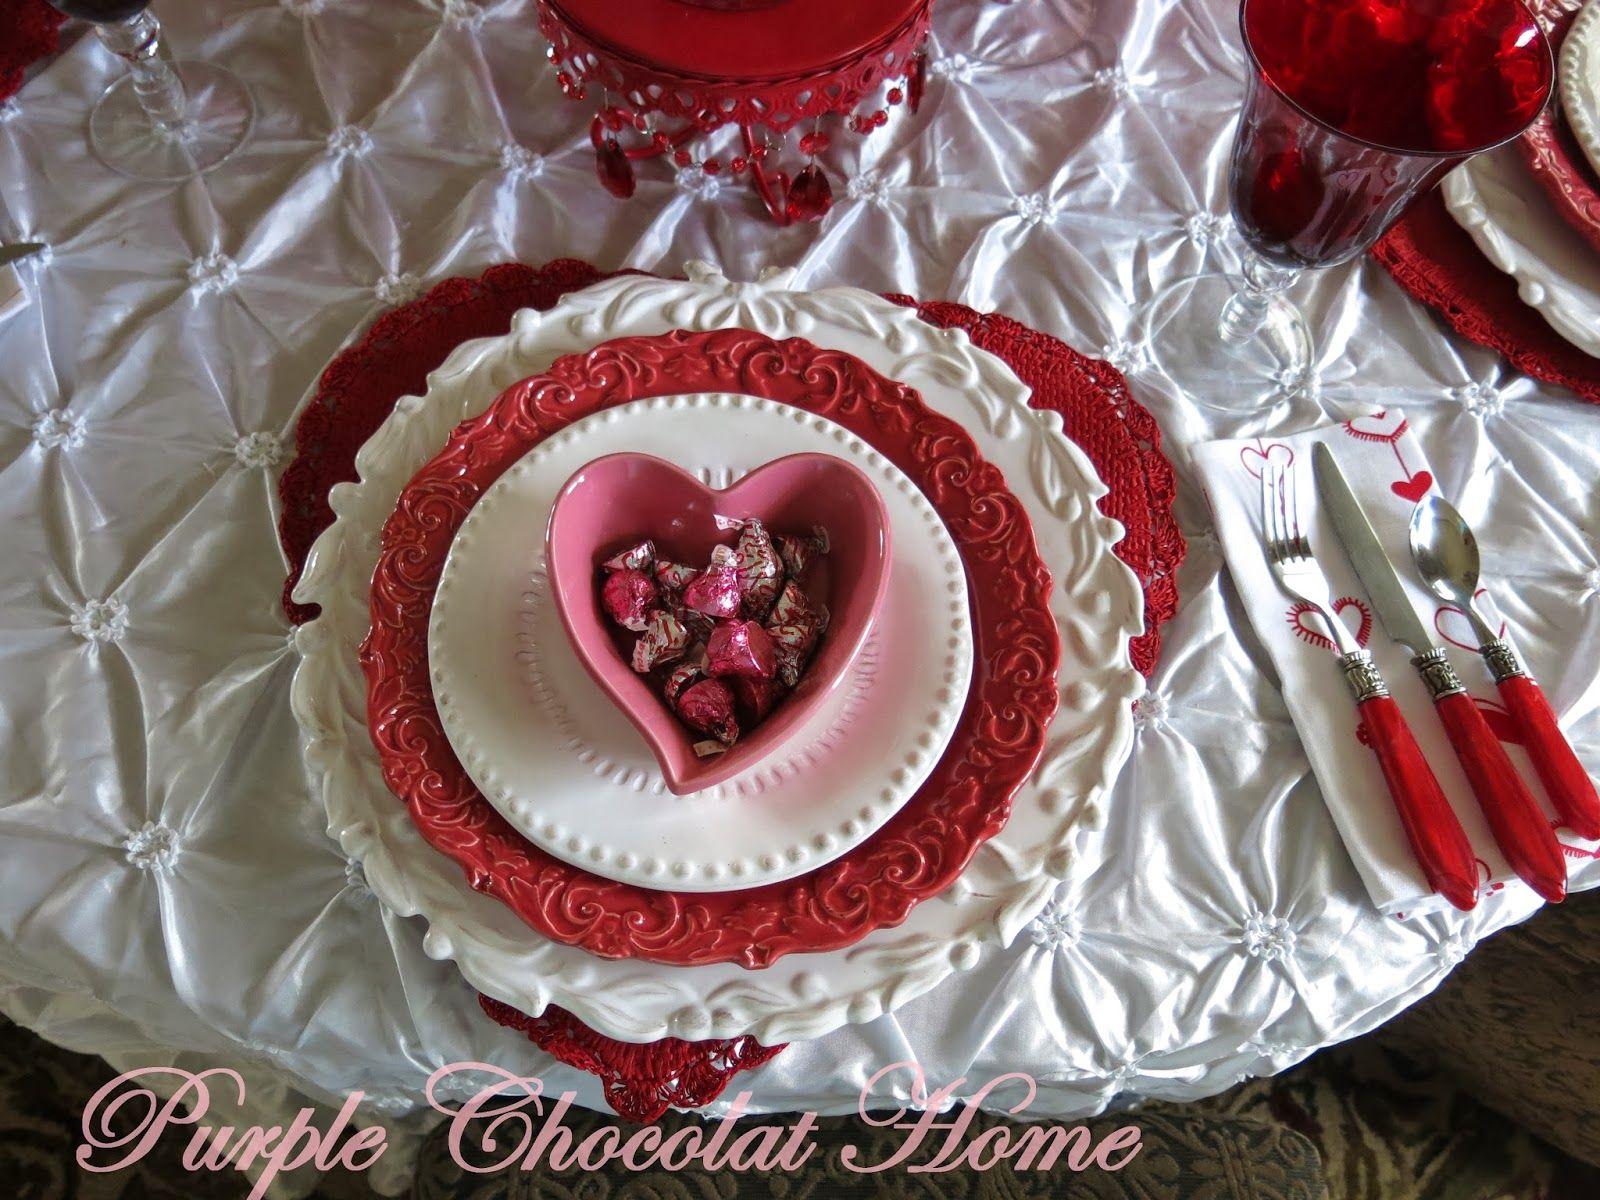 Purple chocolat home valentineus hugs and kisses table valentines